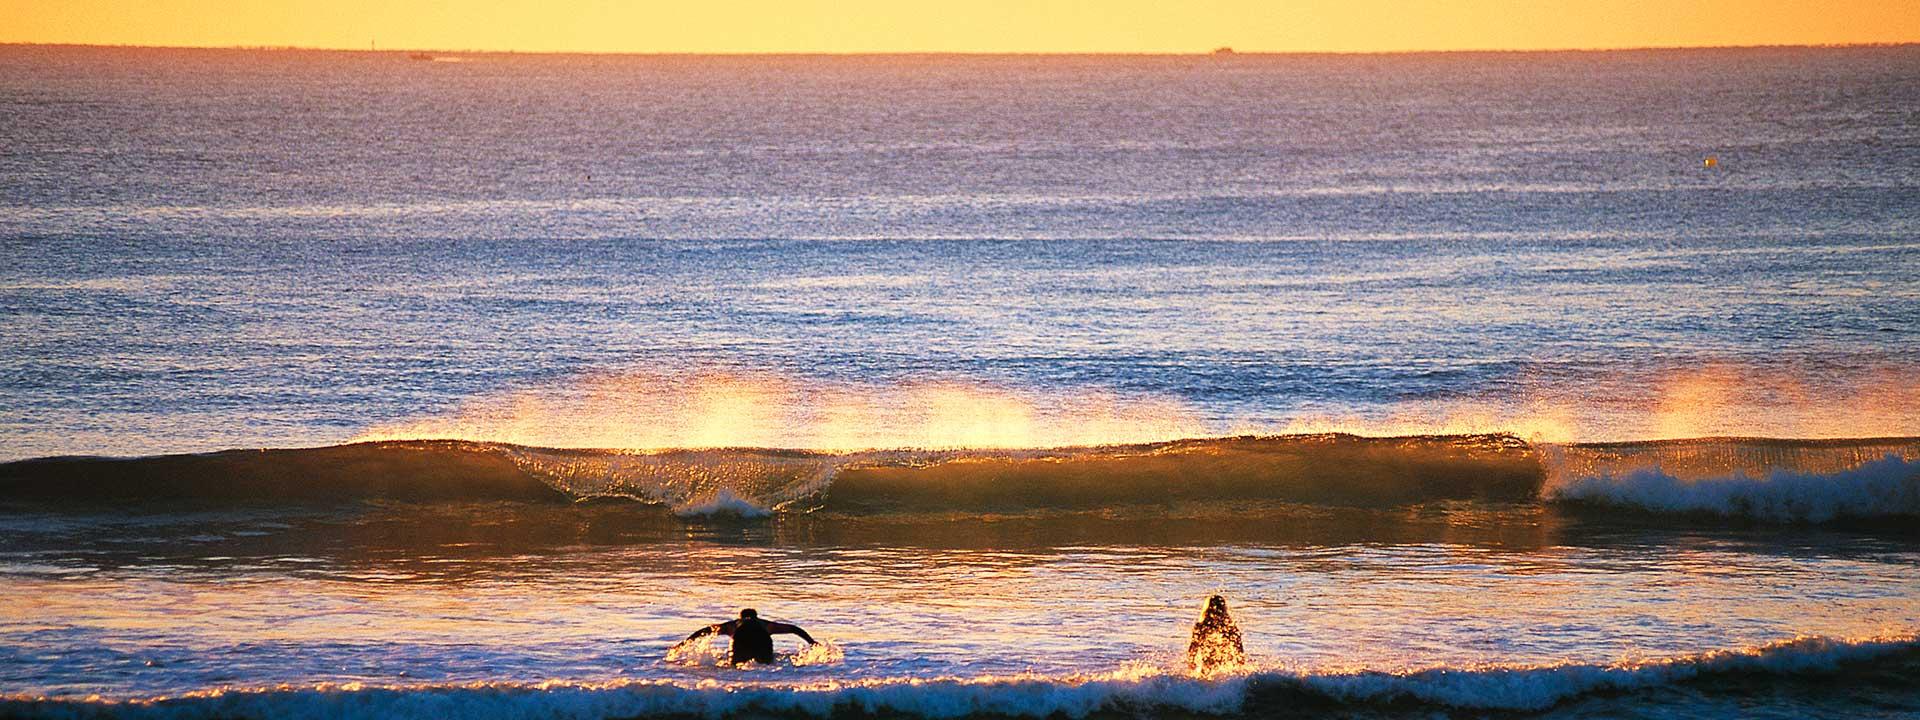 Enjoy an evening swim at Maroochydore Beach